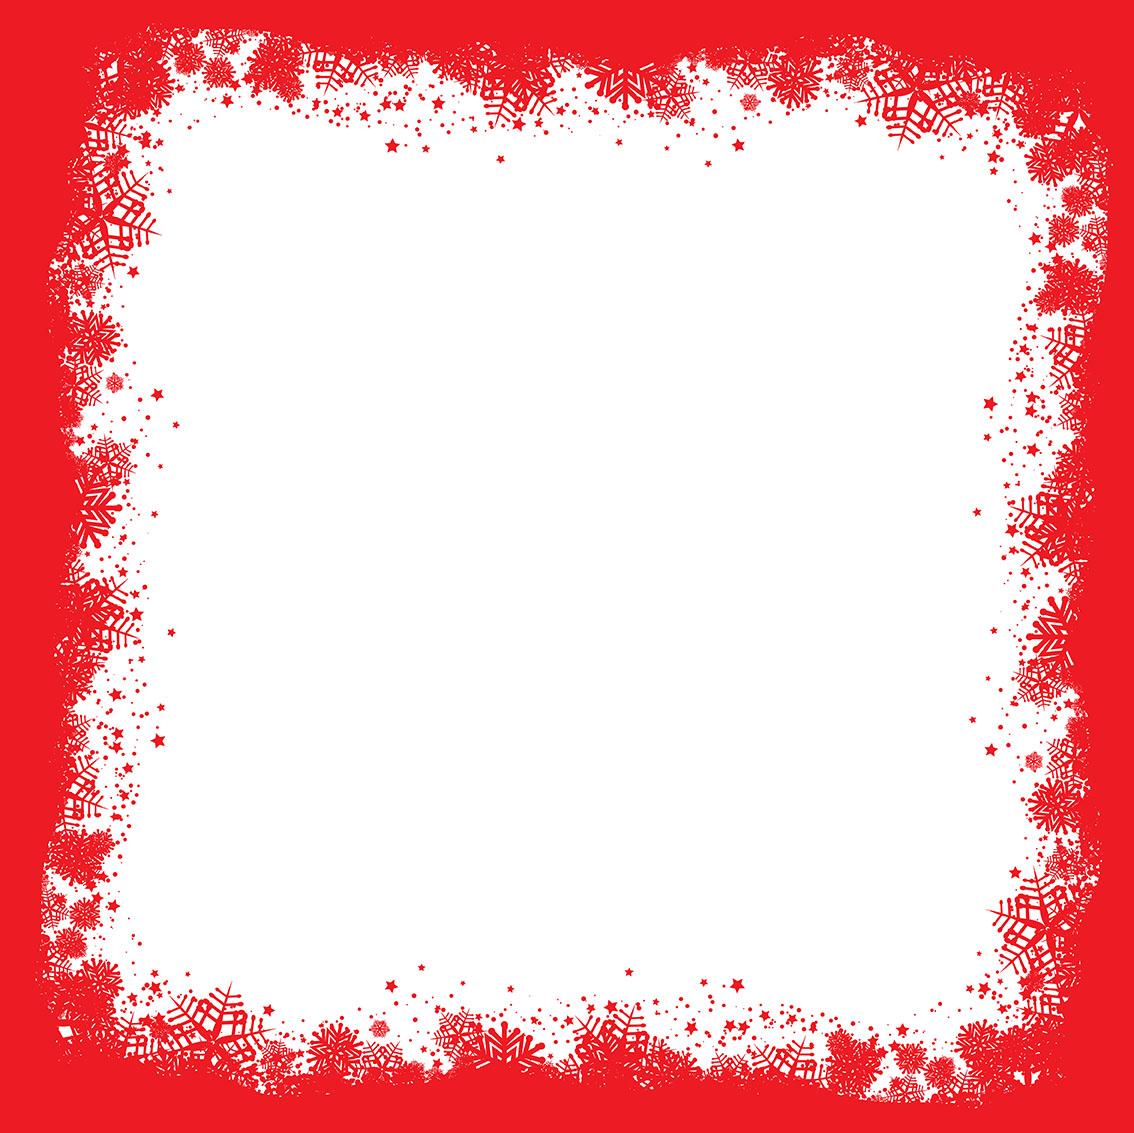 1134x1133 Snowflake Border Free Vector Art